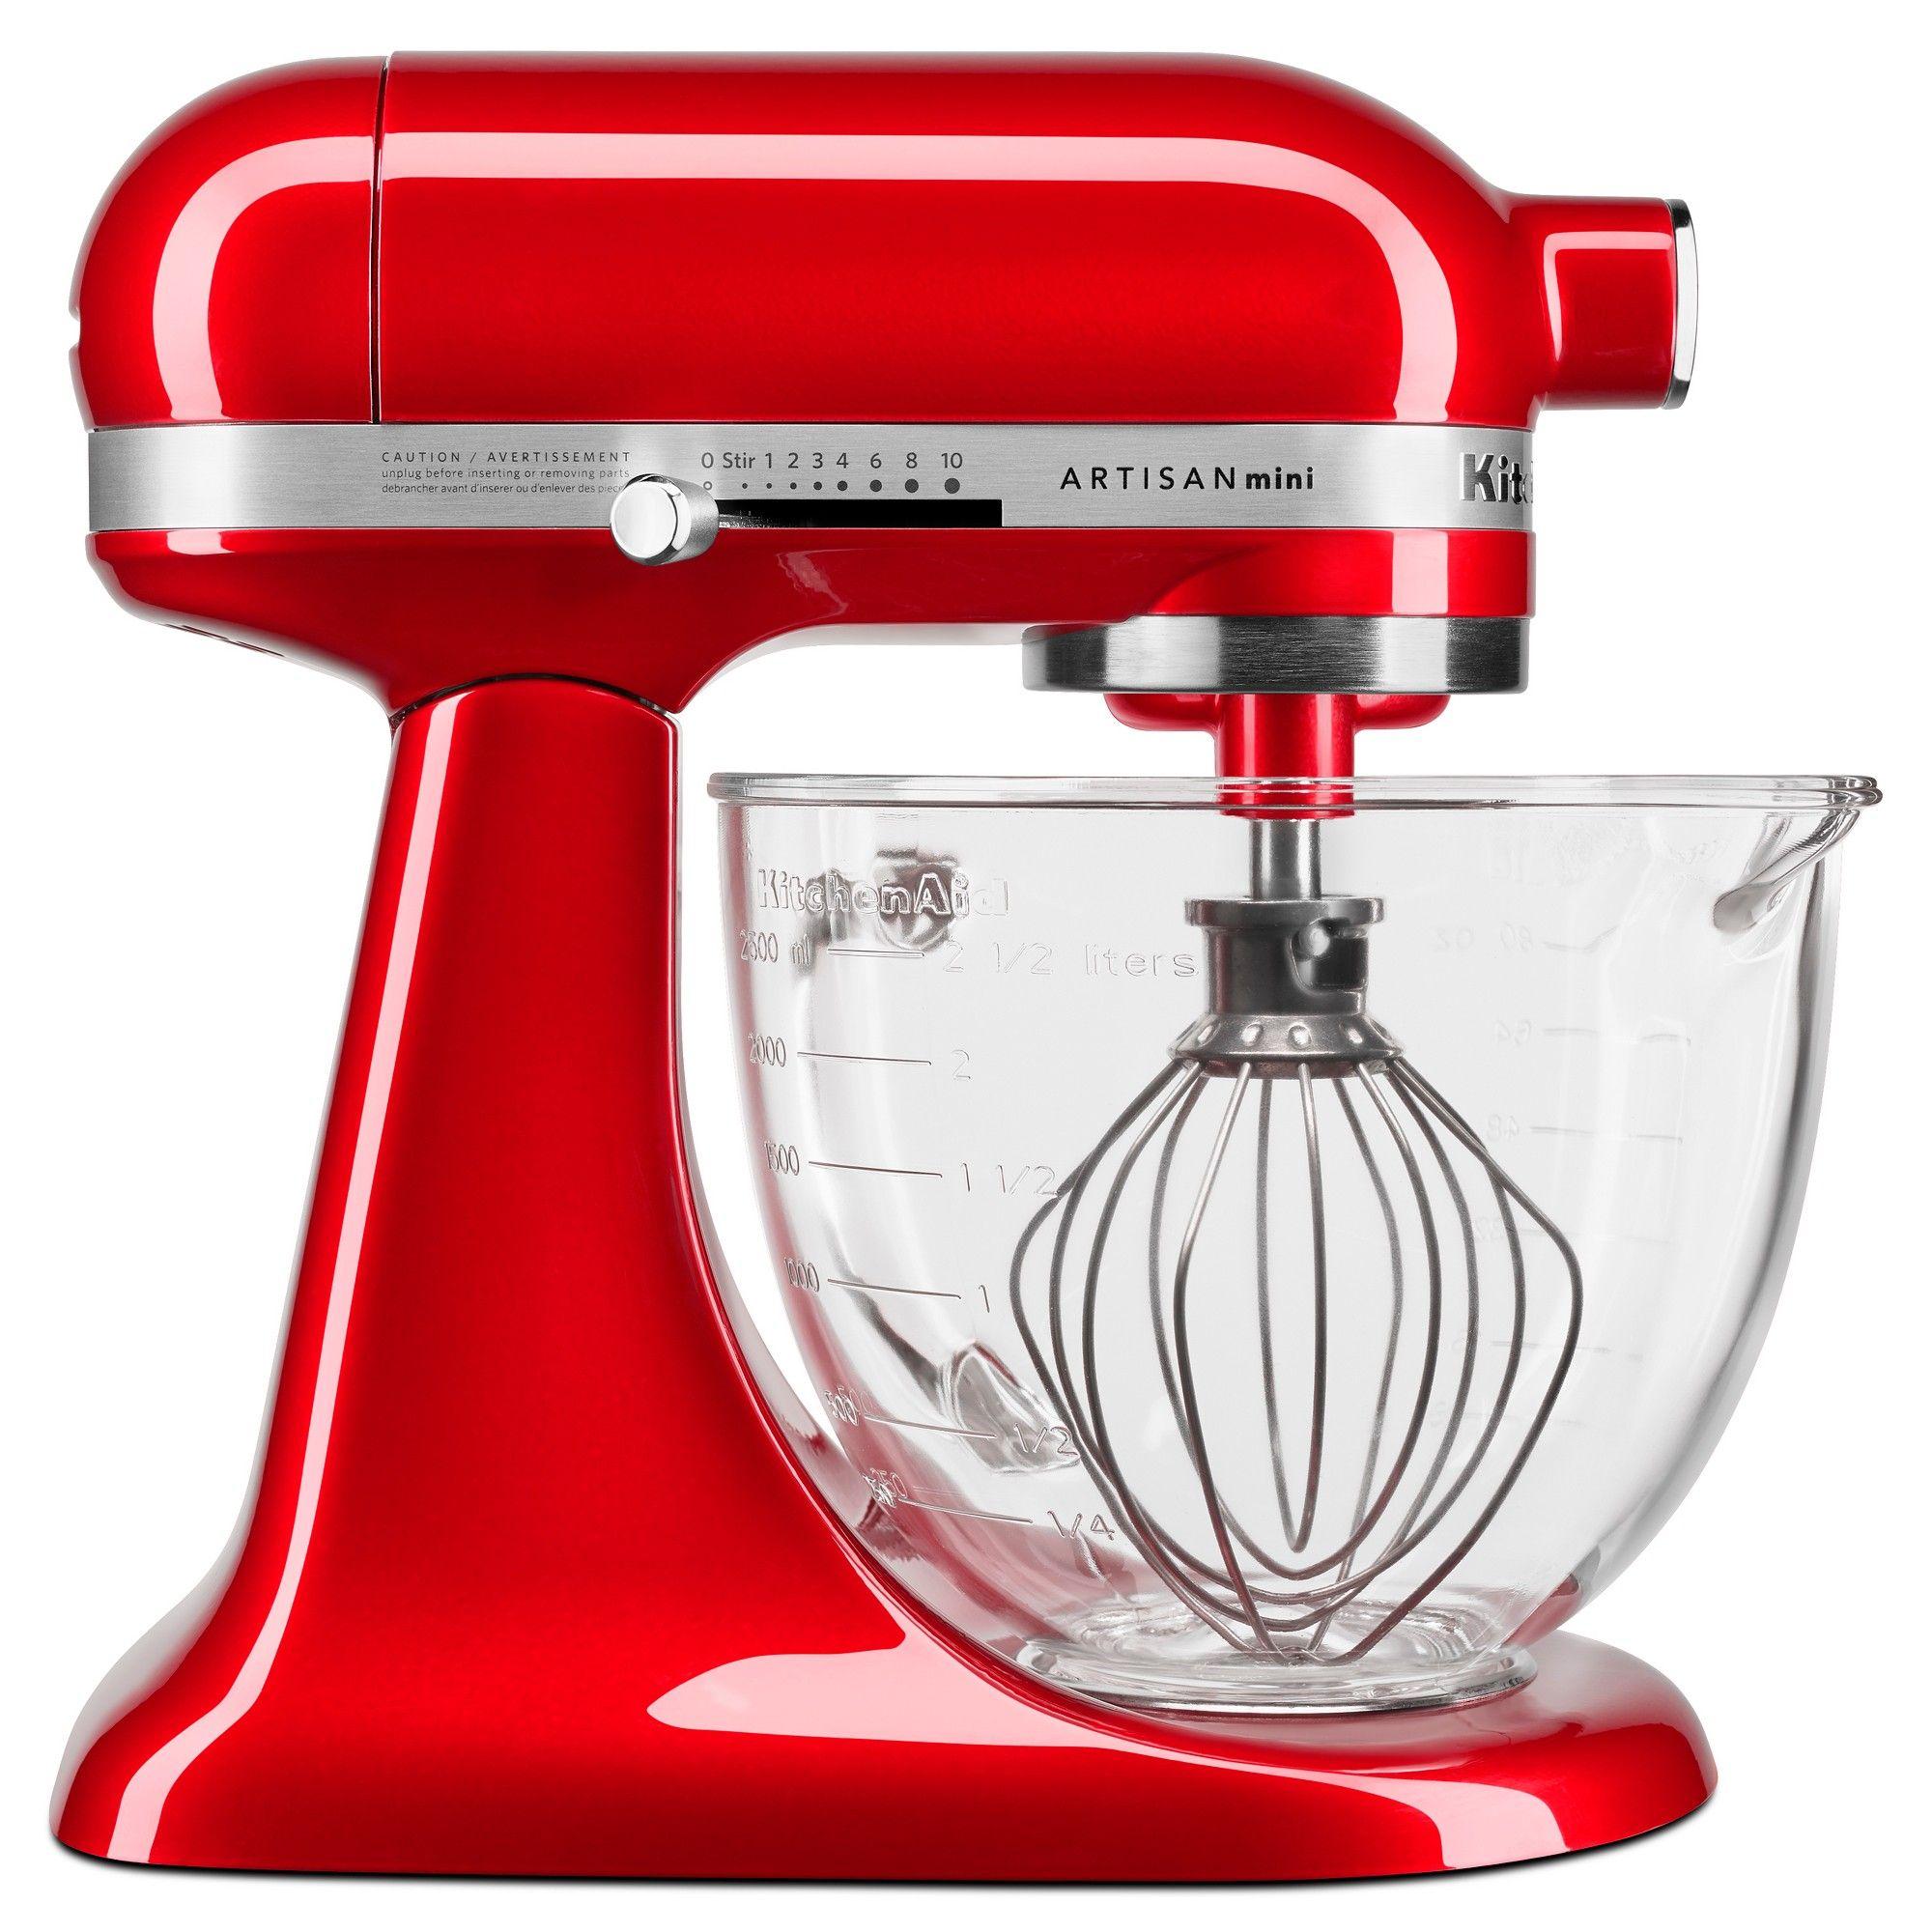 Kitchenaid 35qt artisan mini design tilthead stand mixer